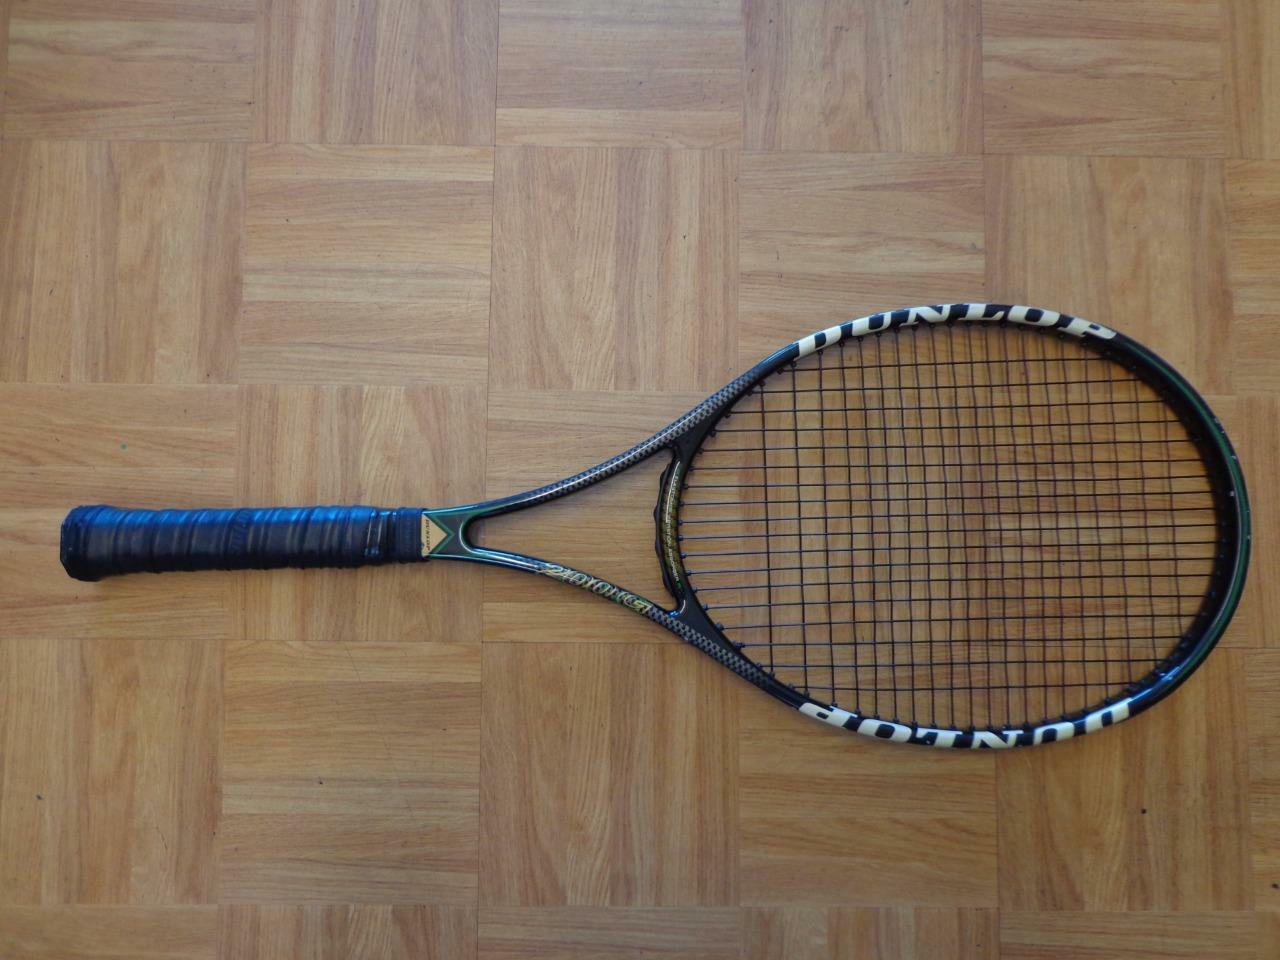 Dunlop Revelation 200G 95 cabeza 18x20 4 1 4 Grip Tenis Raqueta